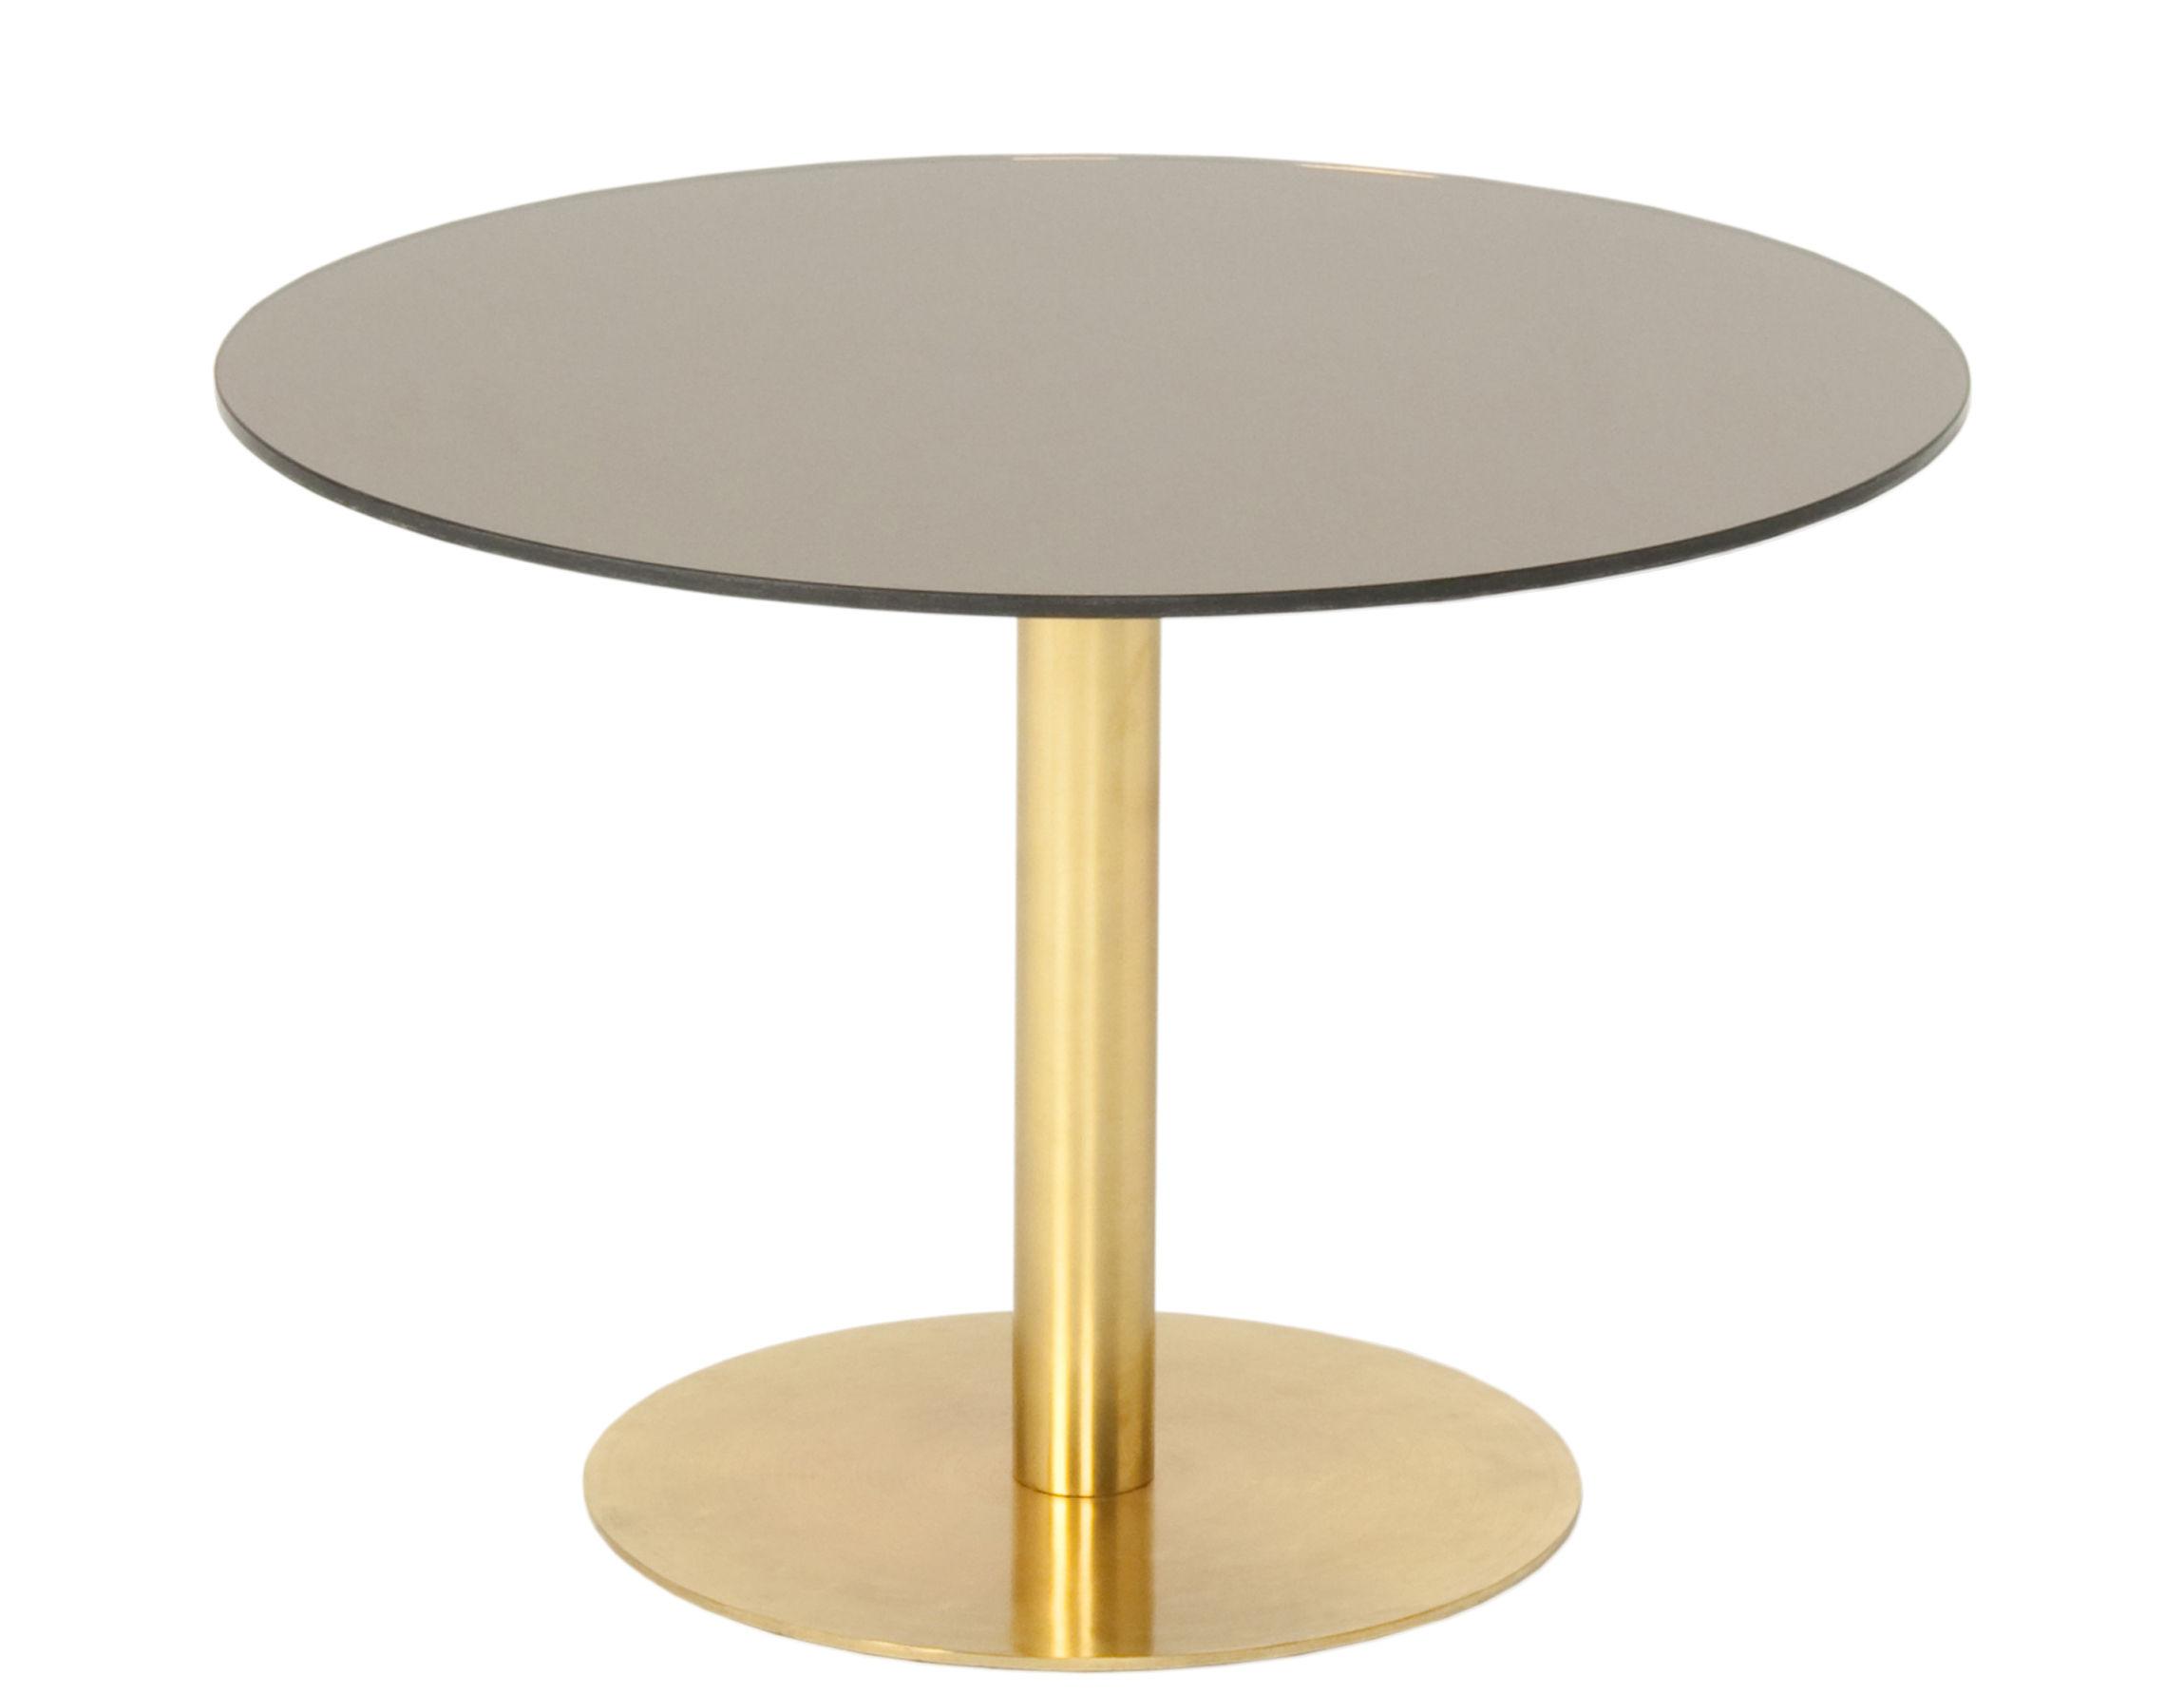 Table basse flash 60 cm bronze or tom dixon - Table basse 2 en 1 ...